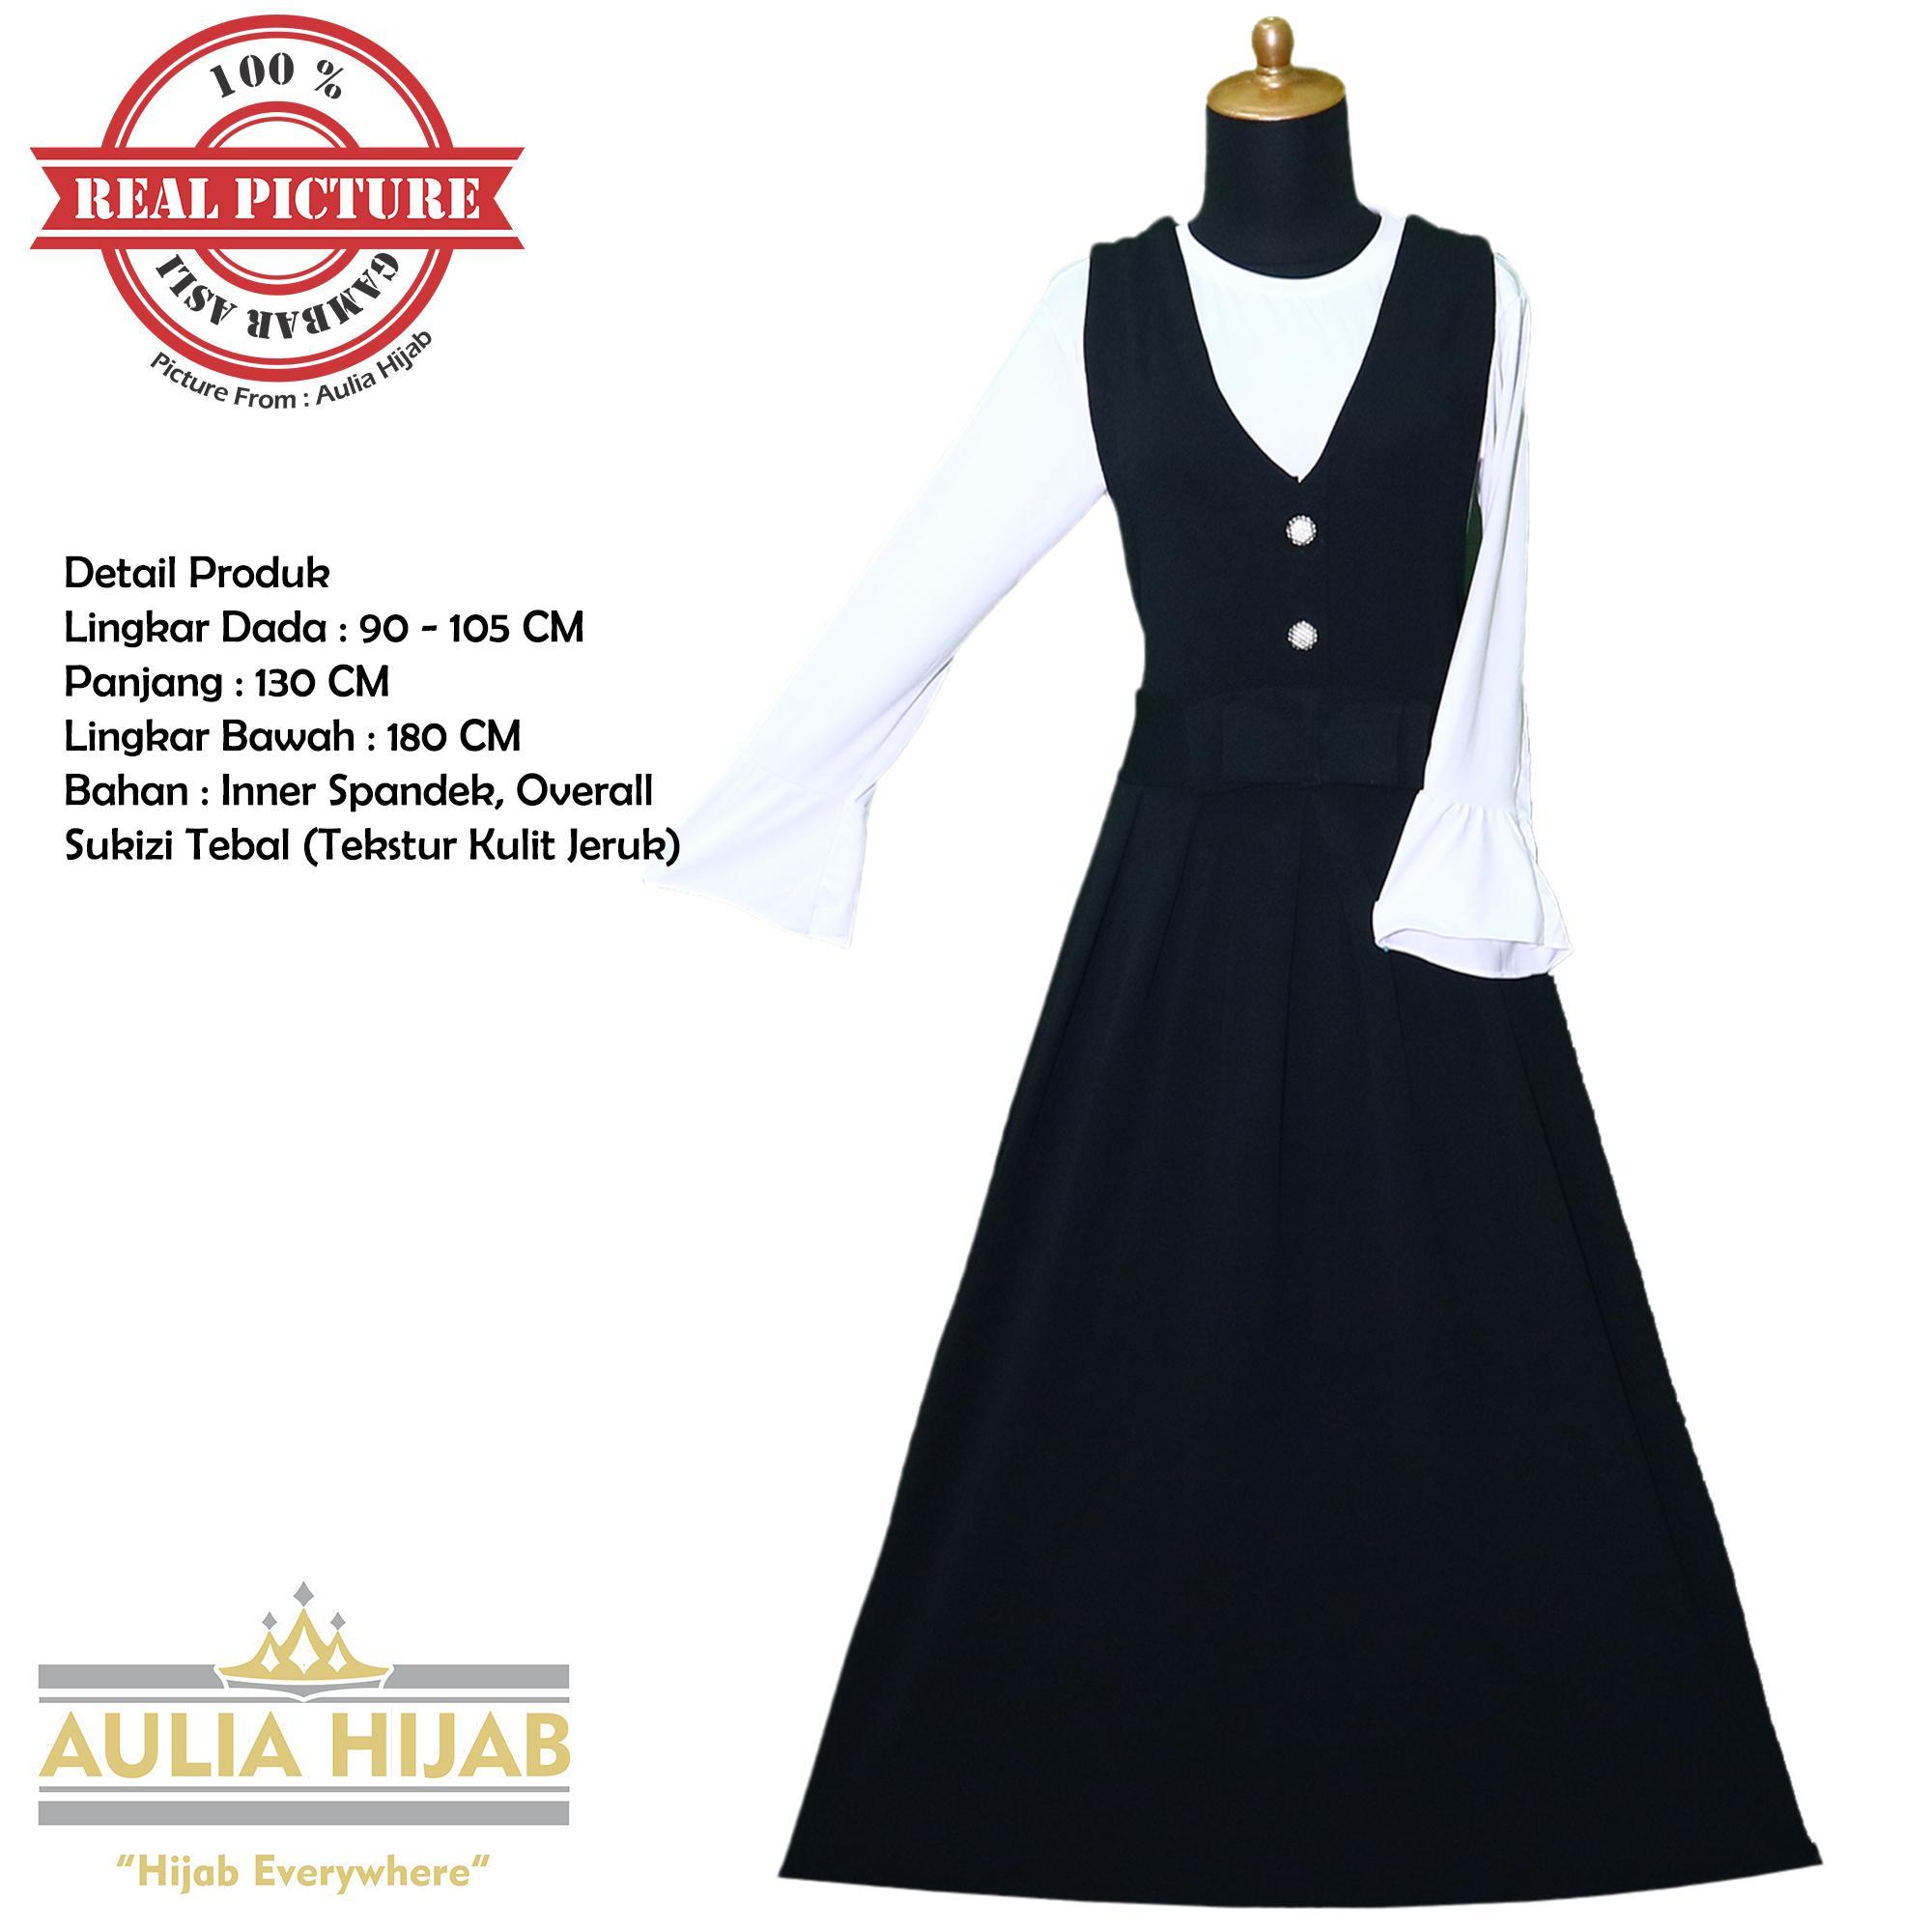 Aulia Hijab - Gamis Overall Annie Overall Bahan Sukizi Premium/Gamis Overall/Overall Murah/Gamis Langsung/Overall Terbaru/Baju Kodok/Gamis Pesta/Gamis Kerja/Gamis Sukizi/Gamis Premium/Sukizi Premium/Overall Gambar Asli/Overall Real Picture/Overall Premium